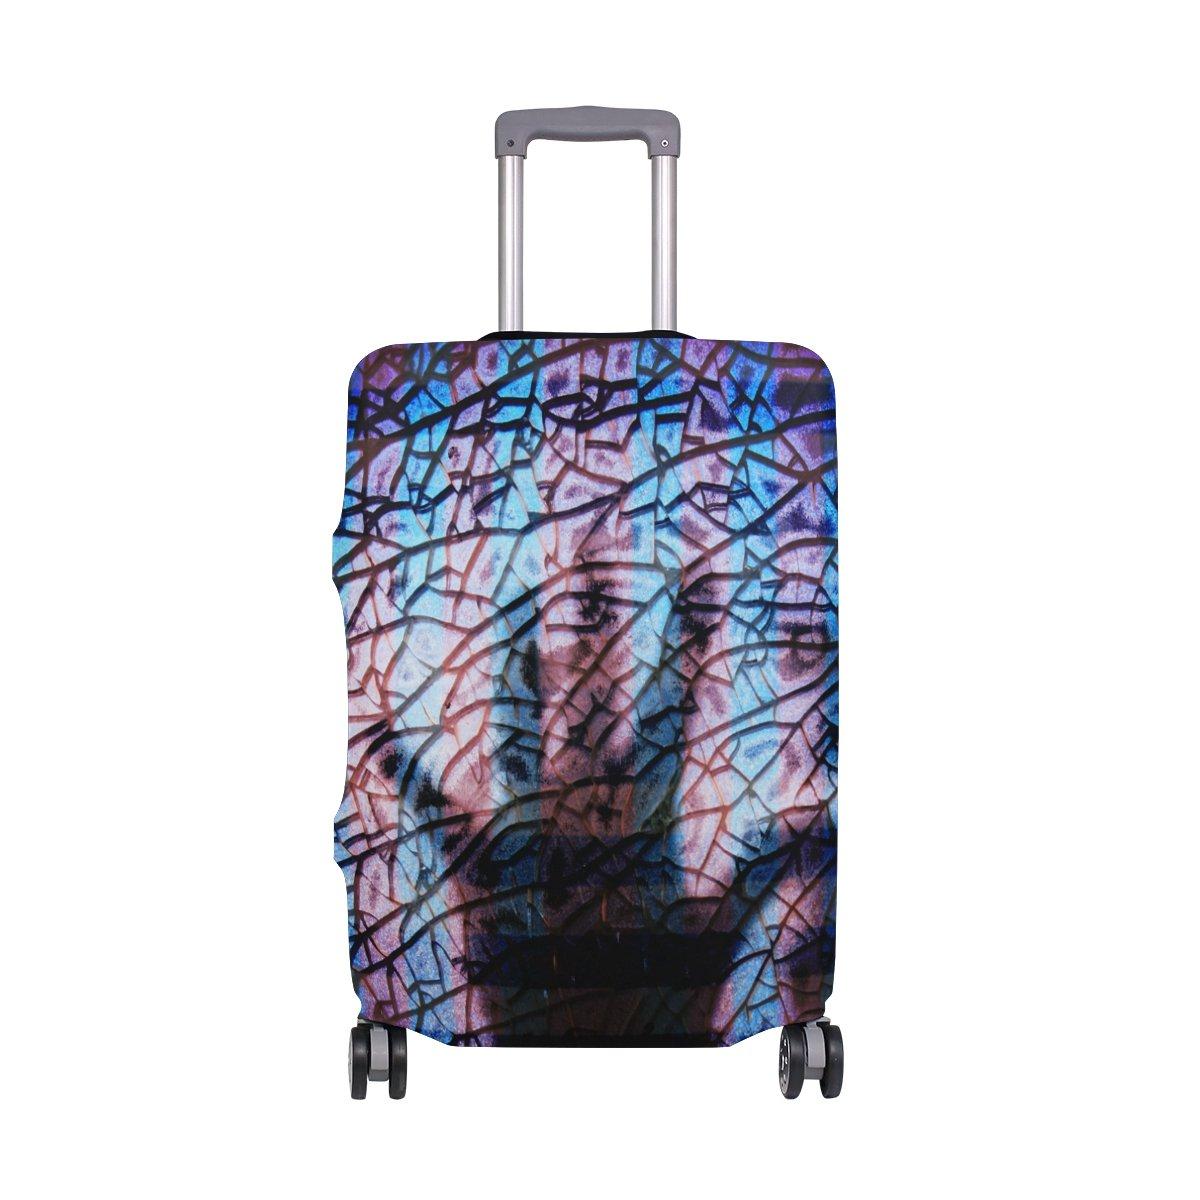 DEYYA Rainbow Stained Glass Splash Spandex Travel Luggage Cover Baggage Suitcase Protector Fits 18-32 Inch by DEYYA